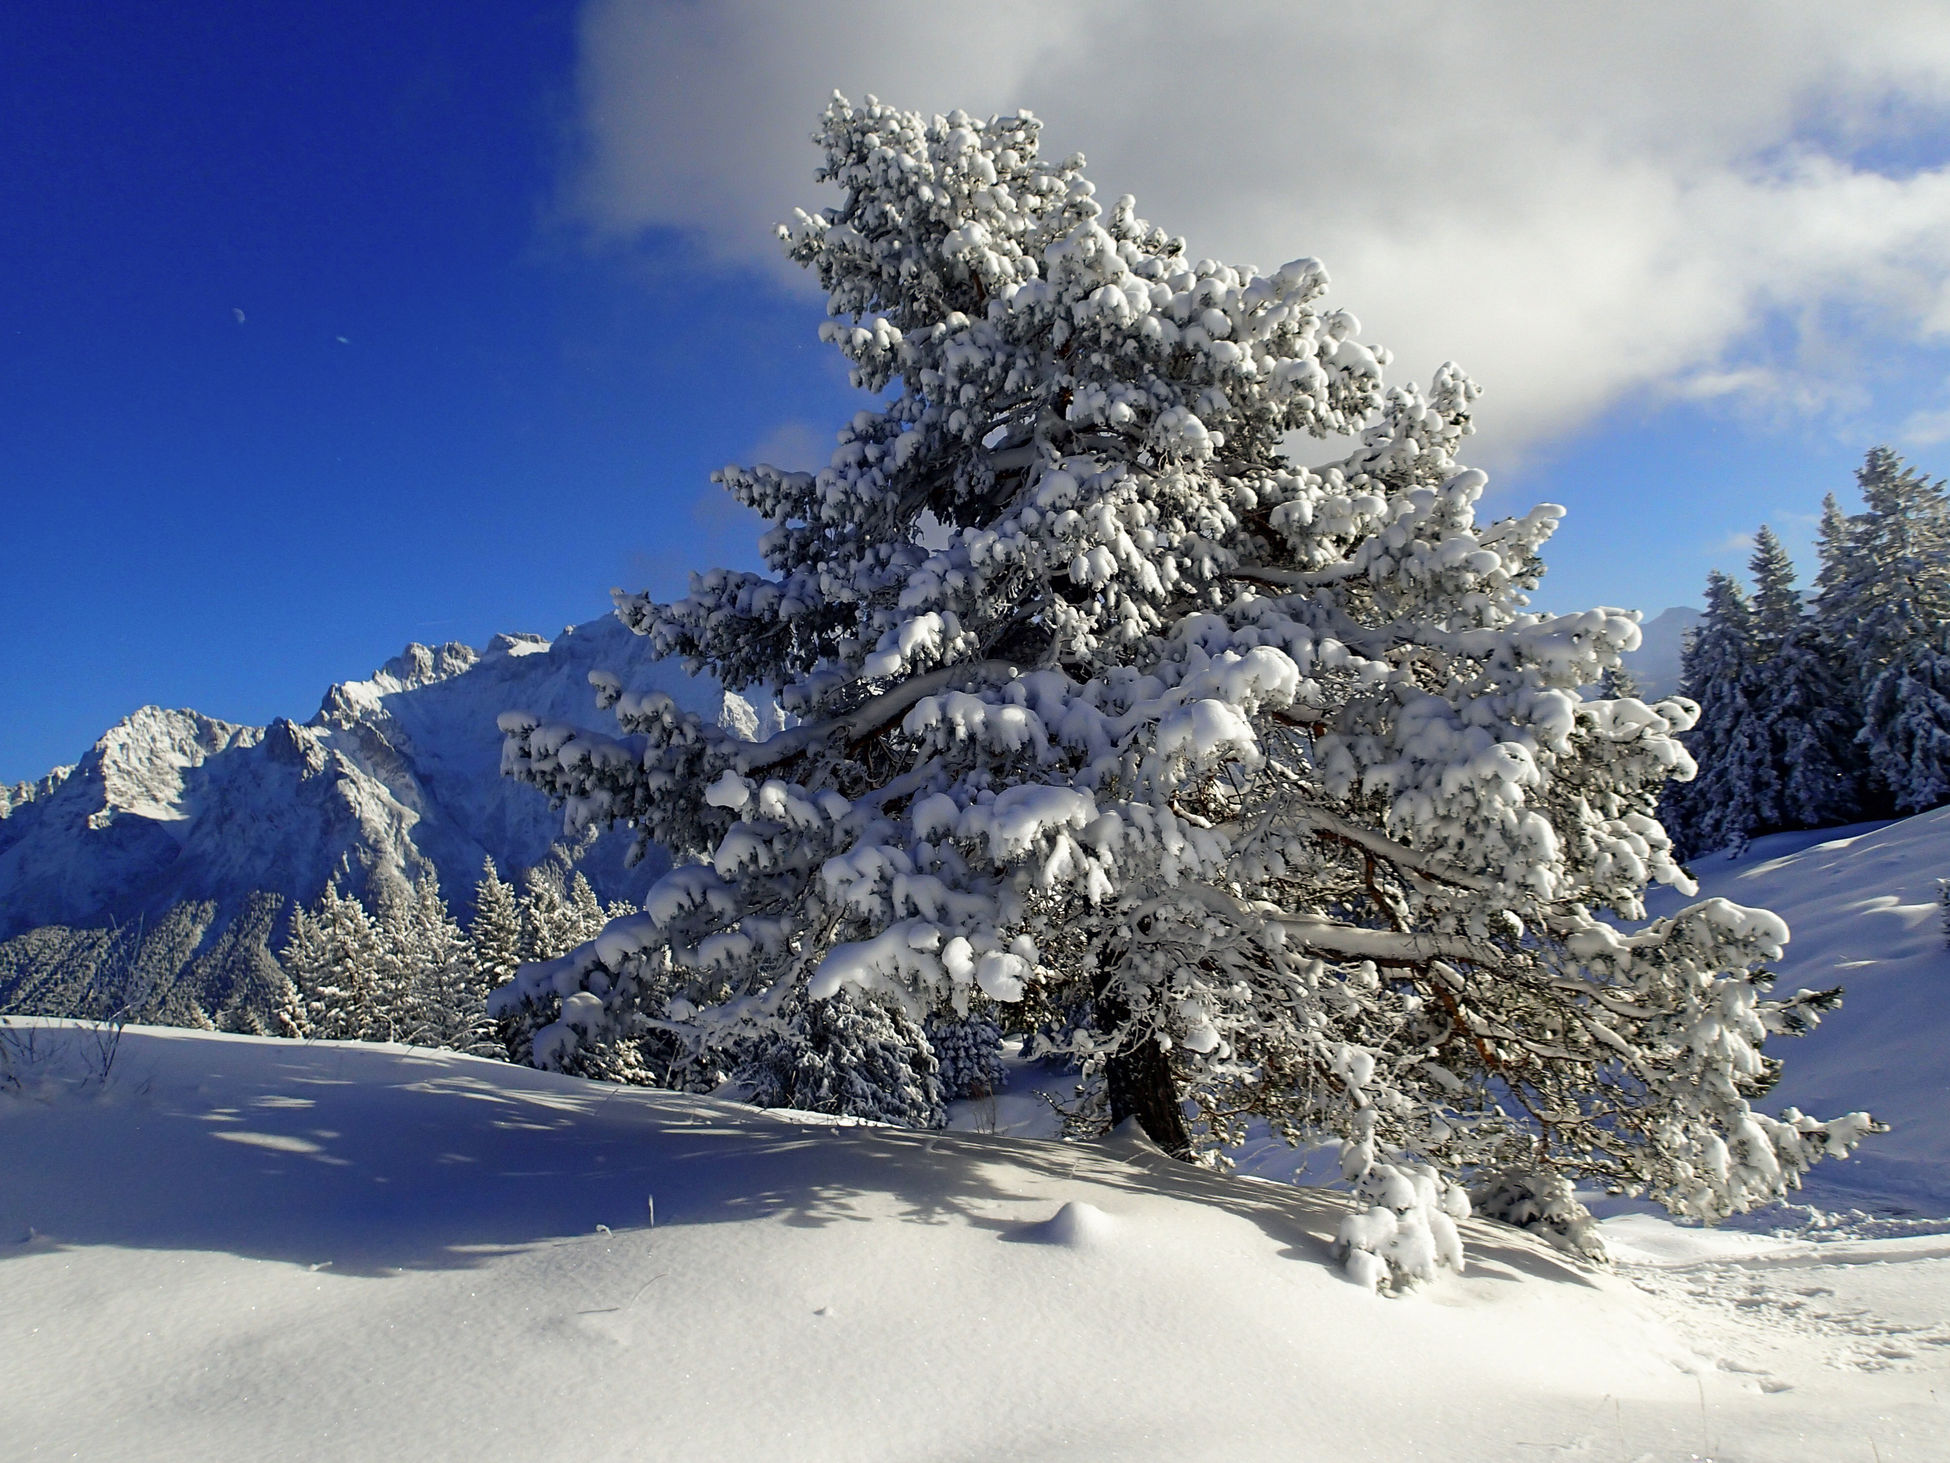 Tree Nature Snow Landscape Winter Cold Temperature Beauty In Nature Mountain Olympus TG-2 EyeEmNewHere Baum Mit Schnee Bäume Tree With Snow Hoher Kranzberg Outdoors Deutschland Bayern Bavaria Winter Wonderland Winter Trees